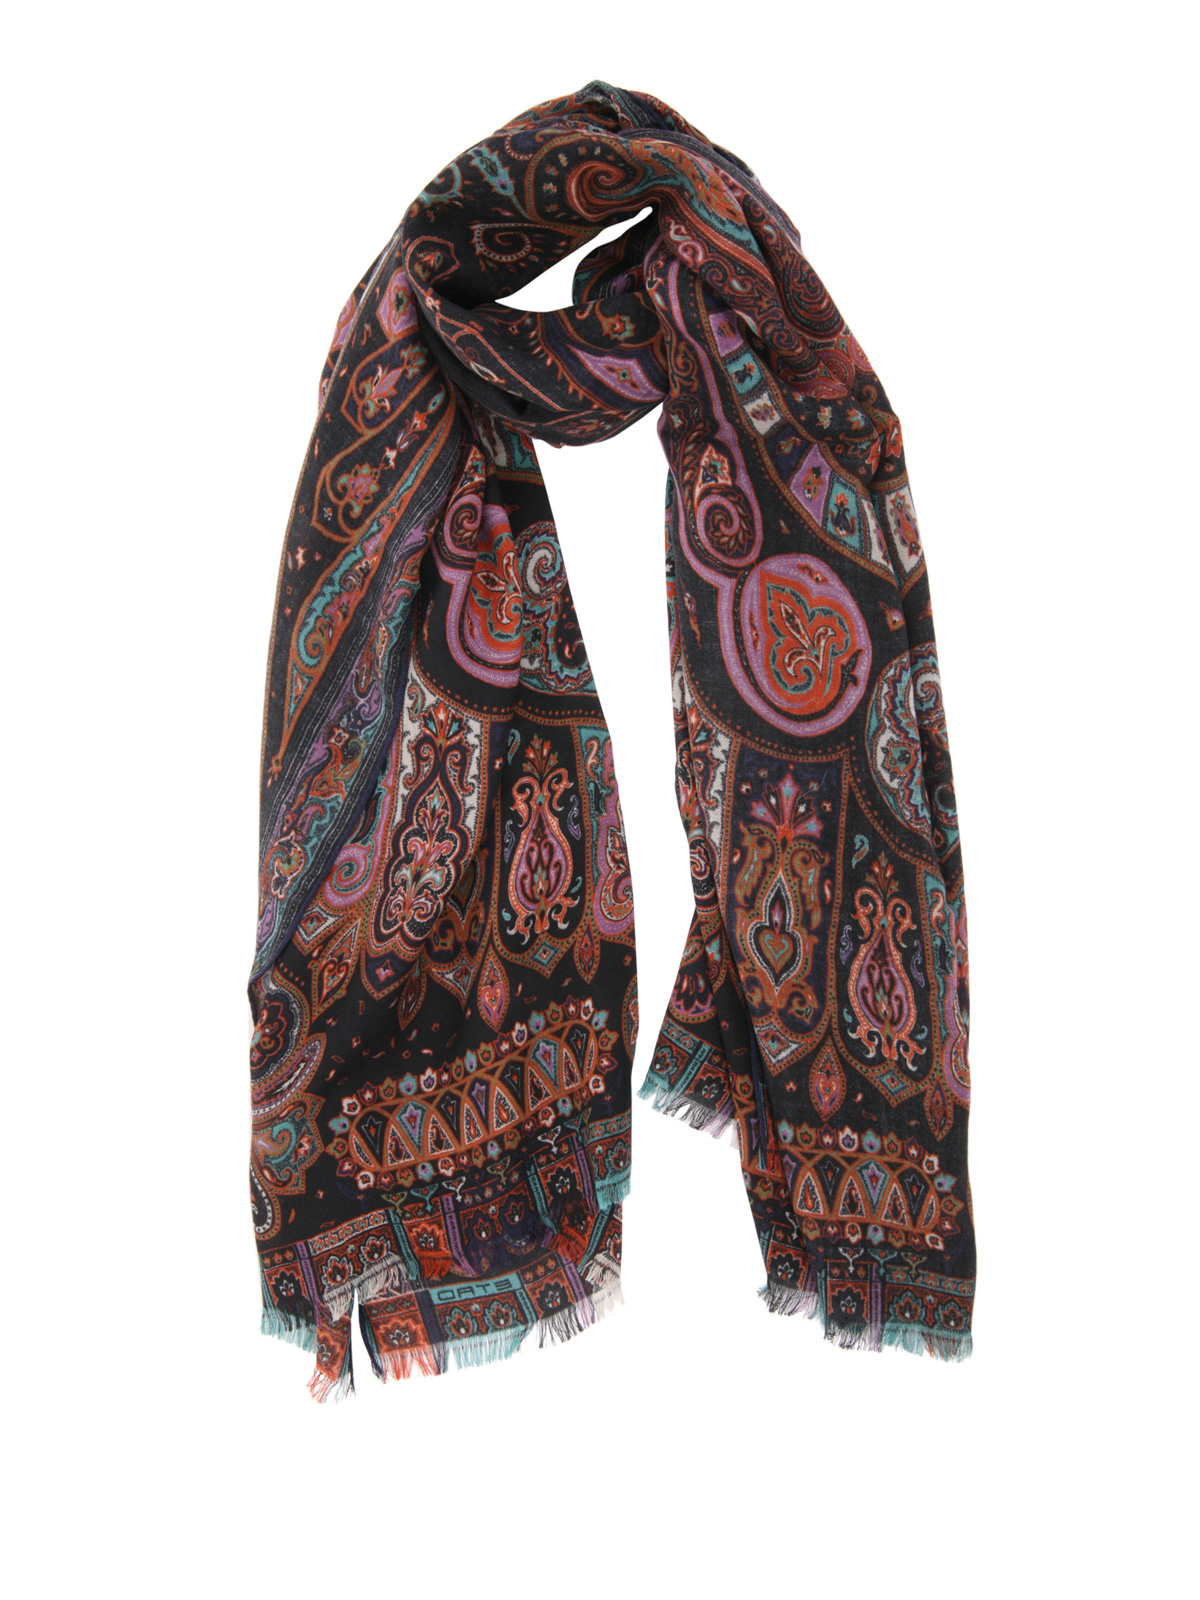 size 40 bf9b9 4a277 Etro - Sciarpa paisley in lana e seta - sciarpe e foulard ...